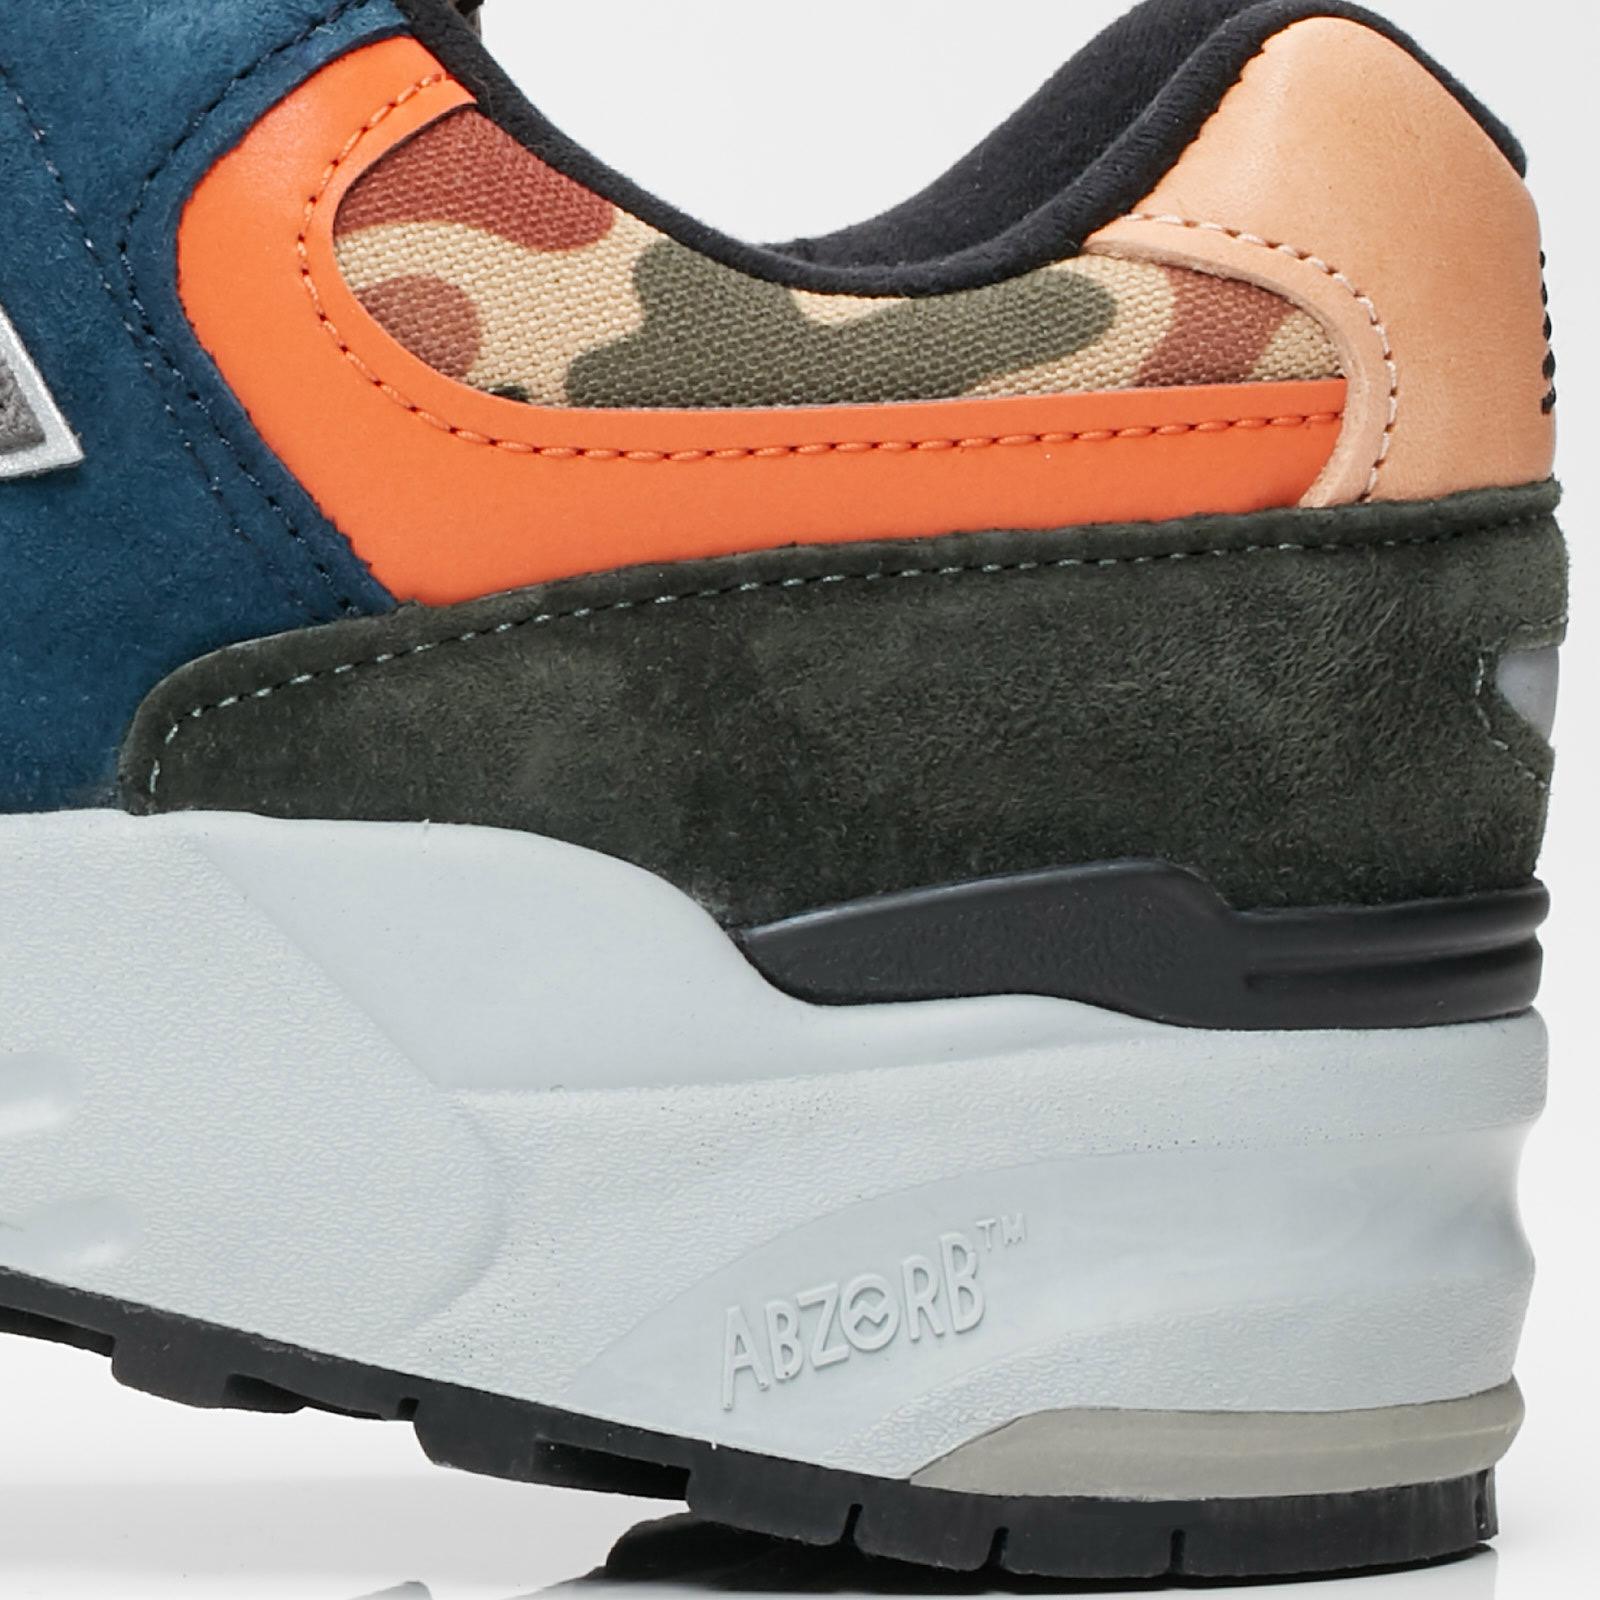 7f19deebc84f7 New Balance M999 - M999ni - Sneakersnstuff   sneakers & streetwear ...